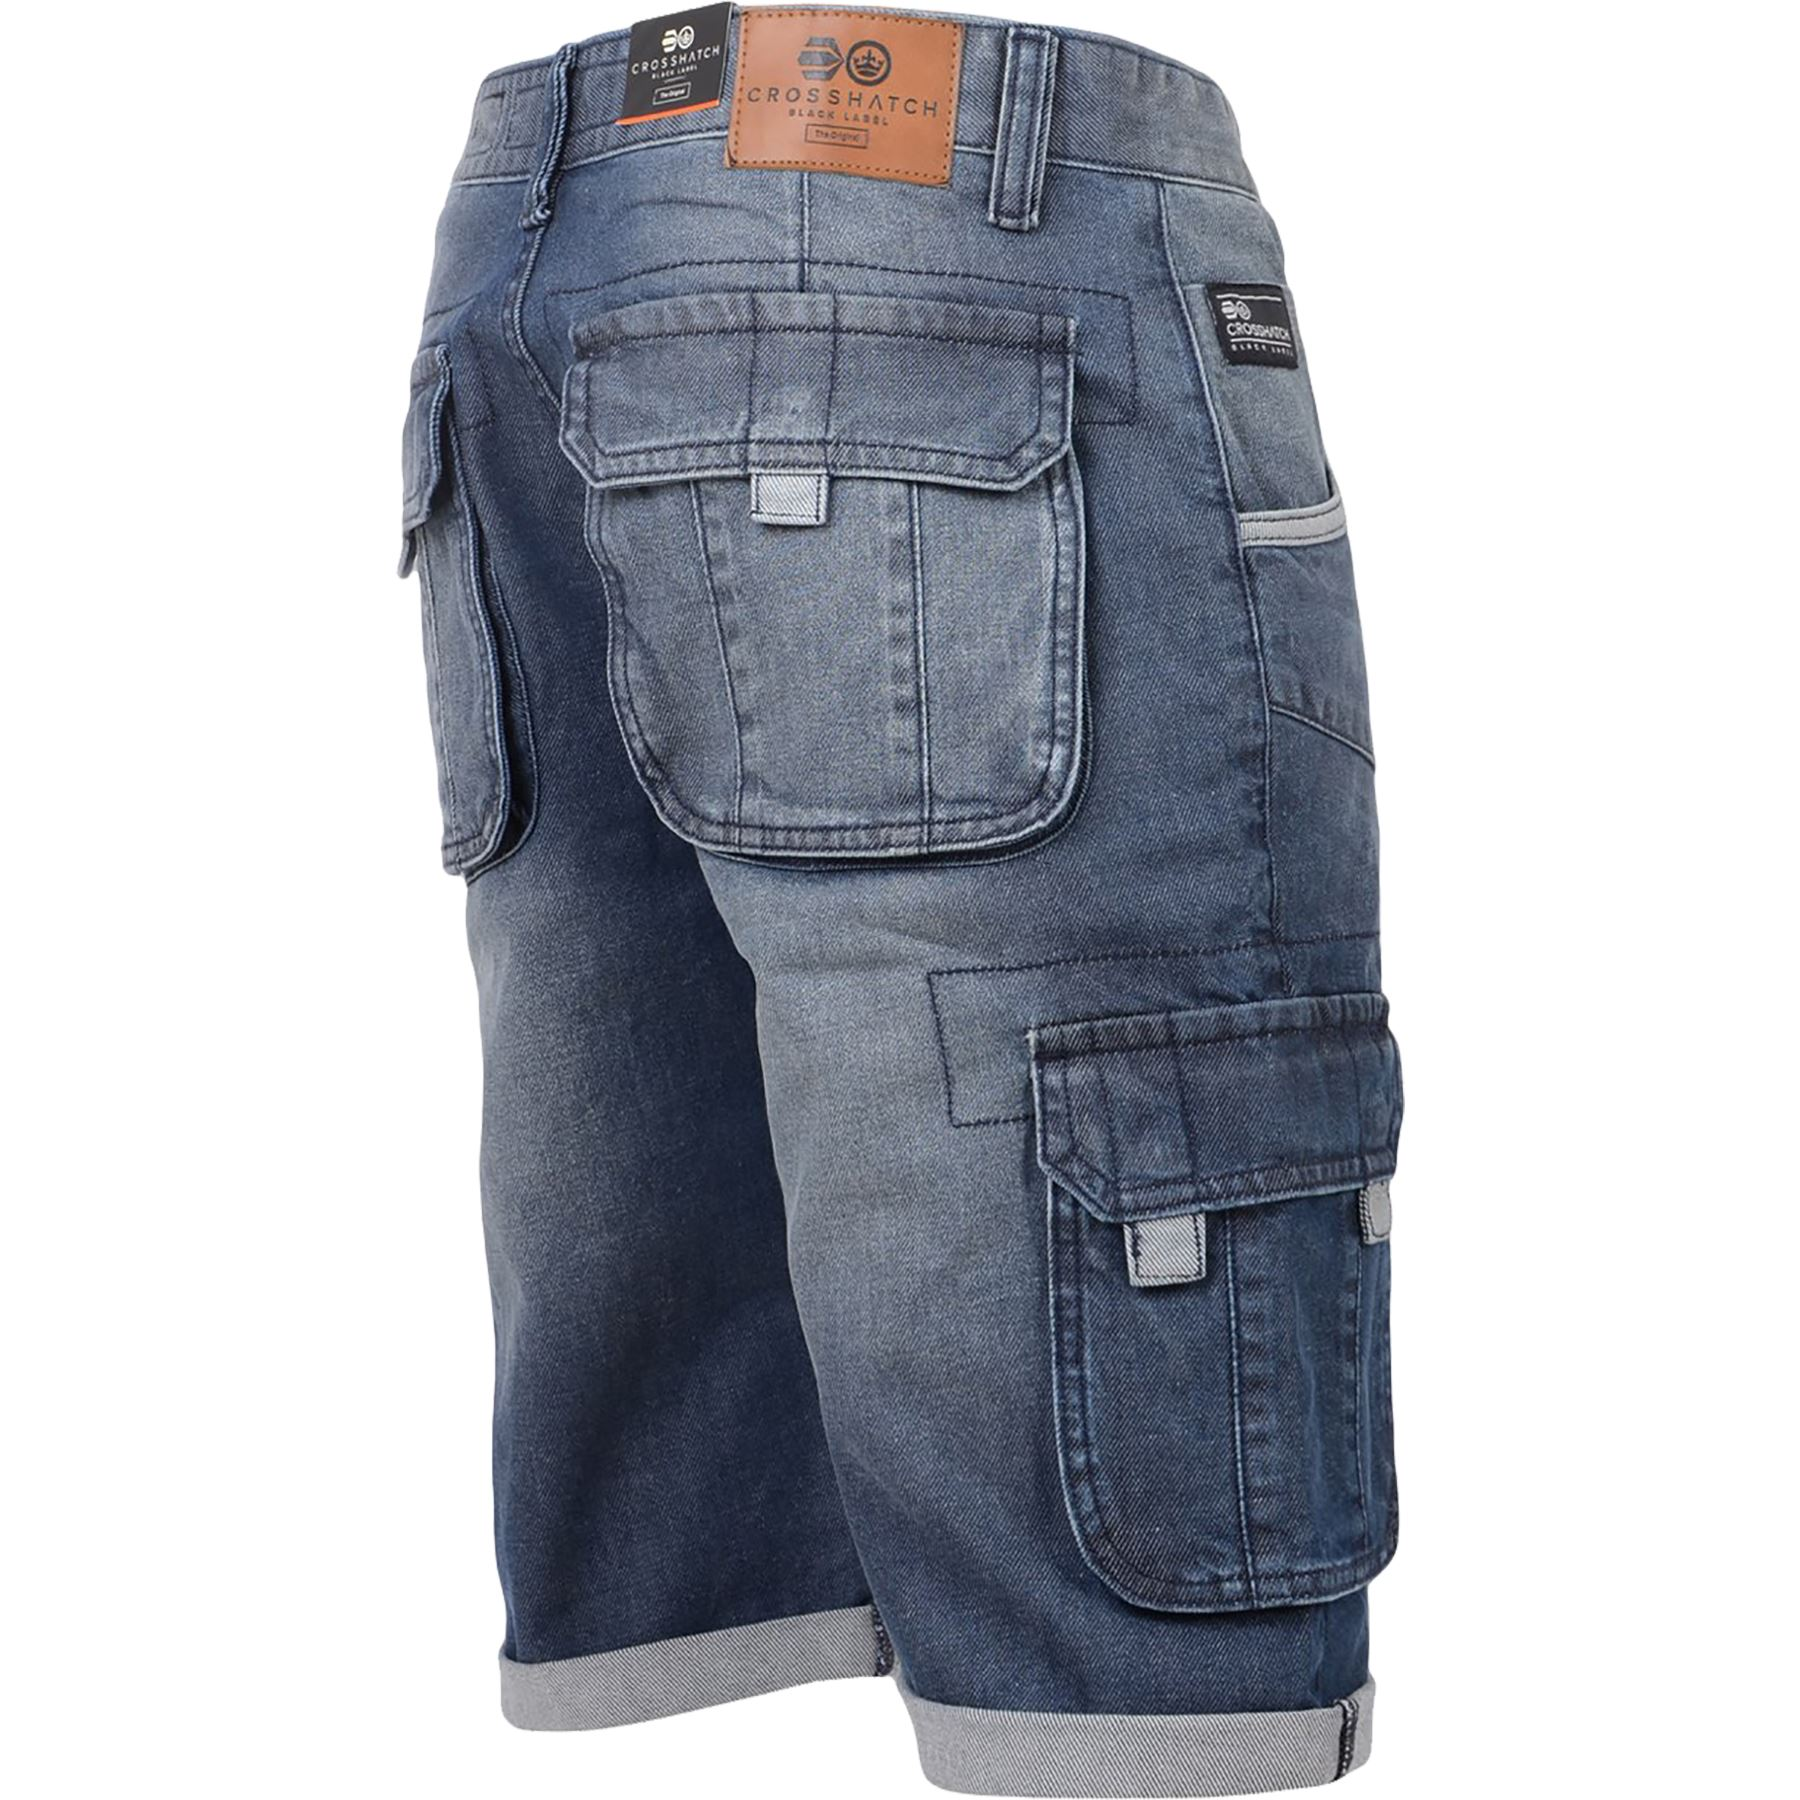 New-Mens-Crosshatch-Canvas-Cargo-Denim-Camo-Shorts-Chino-2019-Styles-30-42-034 thumbnail 14